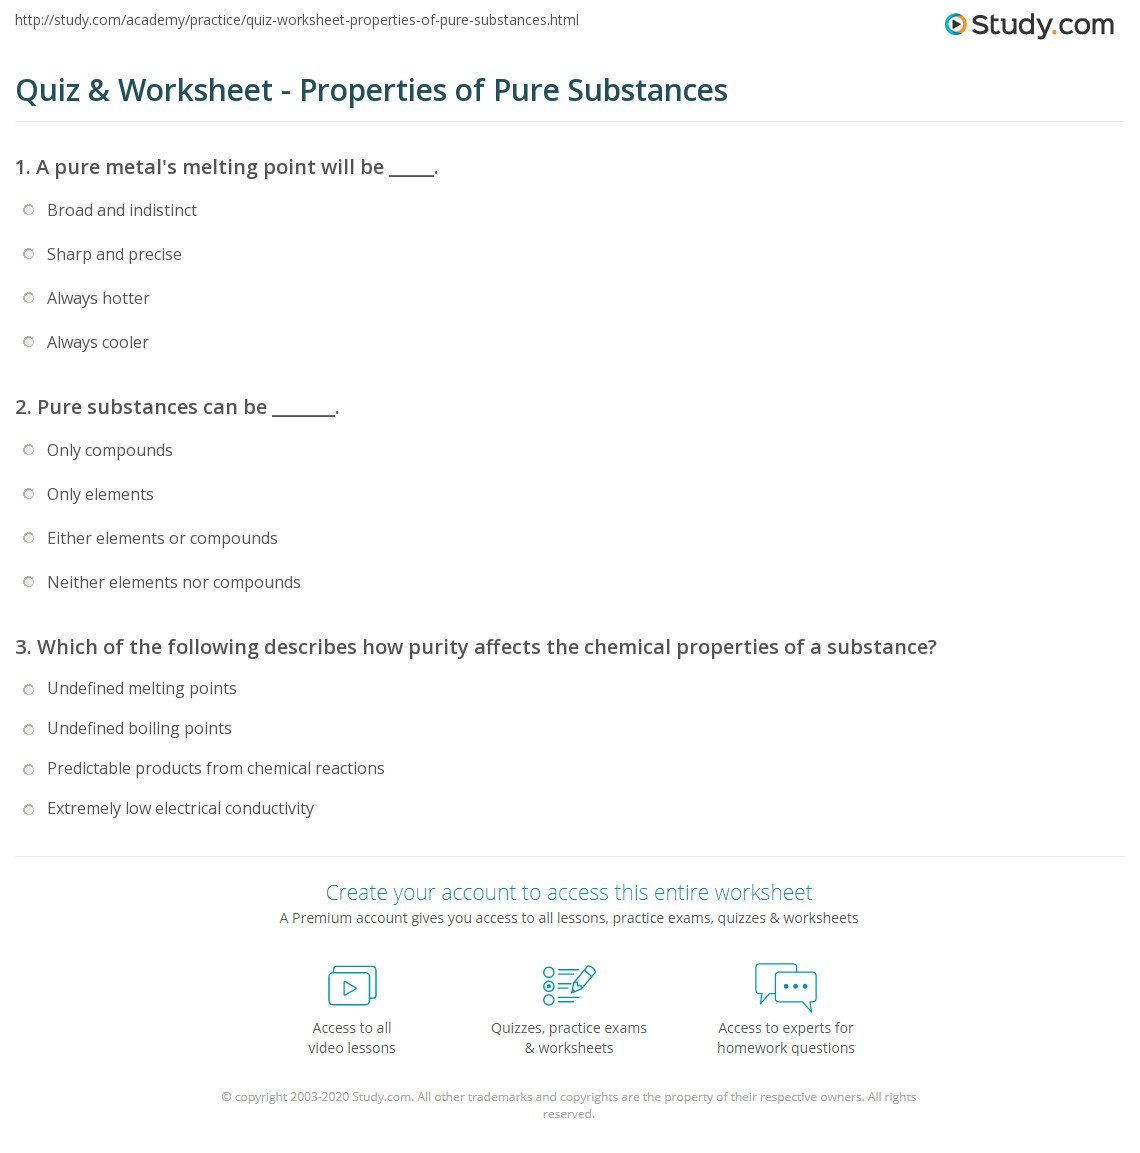 quiz & worksheet - properties of pure substances | study